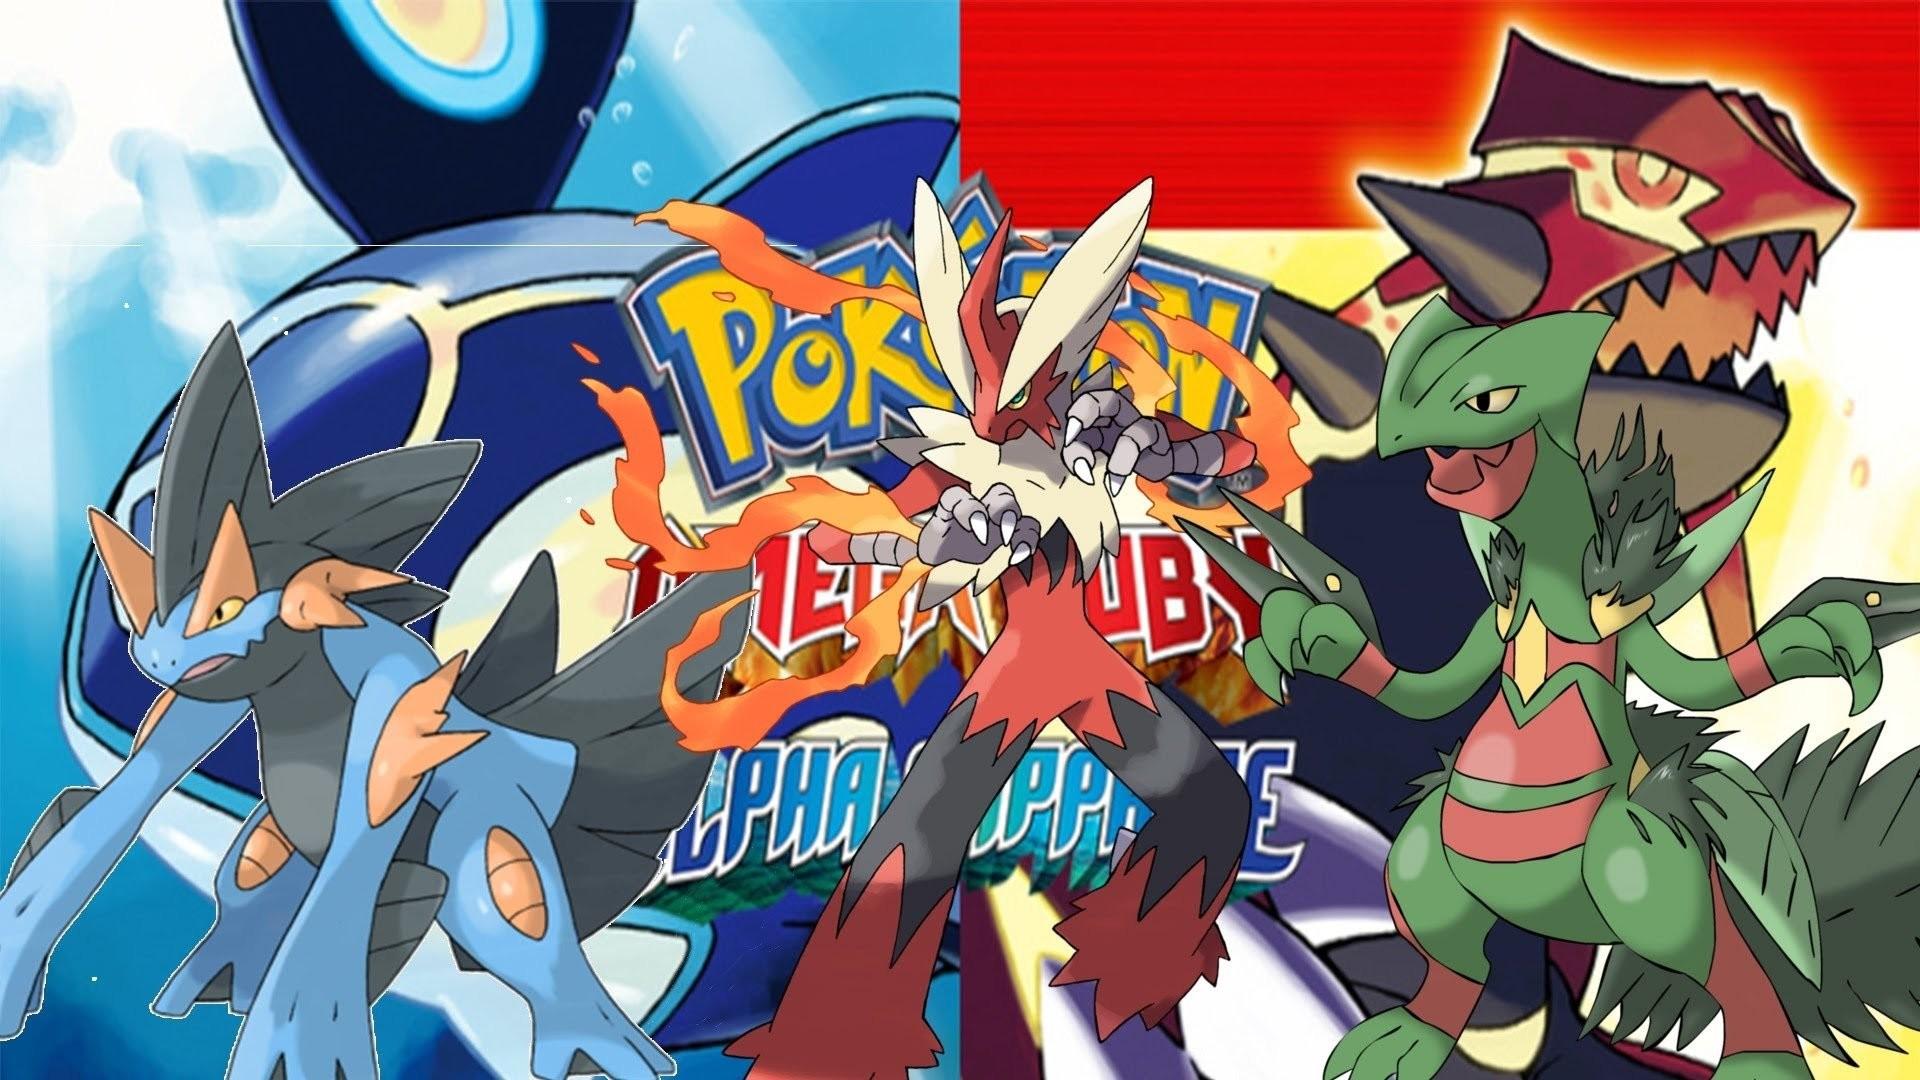 Pokemon mega charizard x wallpaper 80 images 1920x1080 pokemon x wifi battle 01 shiny mega charizard y vs mega mewtwo y youtube voltagebd Choice Image